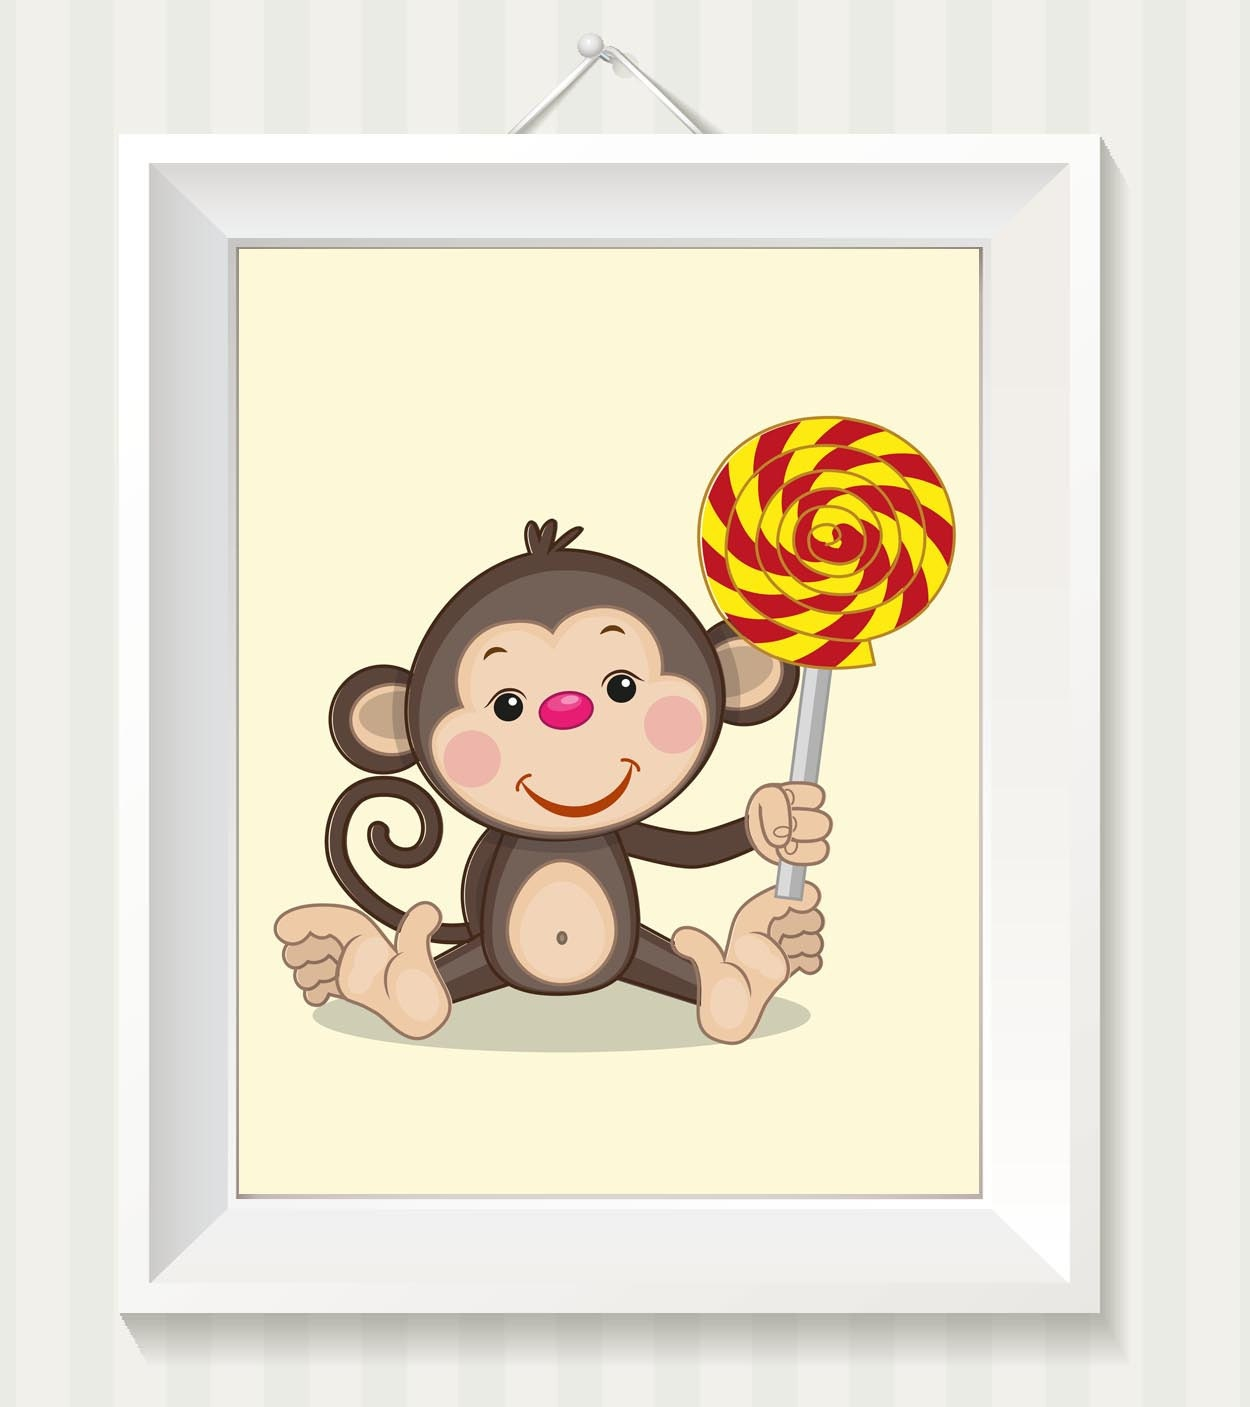 Monkey Nursery Art Monkey Nursery Print Baby Art Baby Animal Brown Beige Red Yellow Lolly Pop Sucker